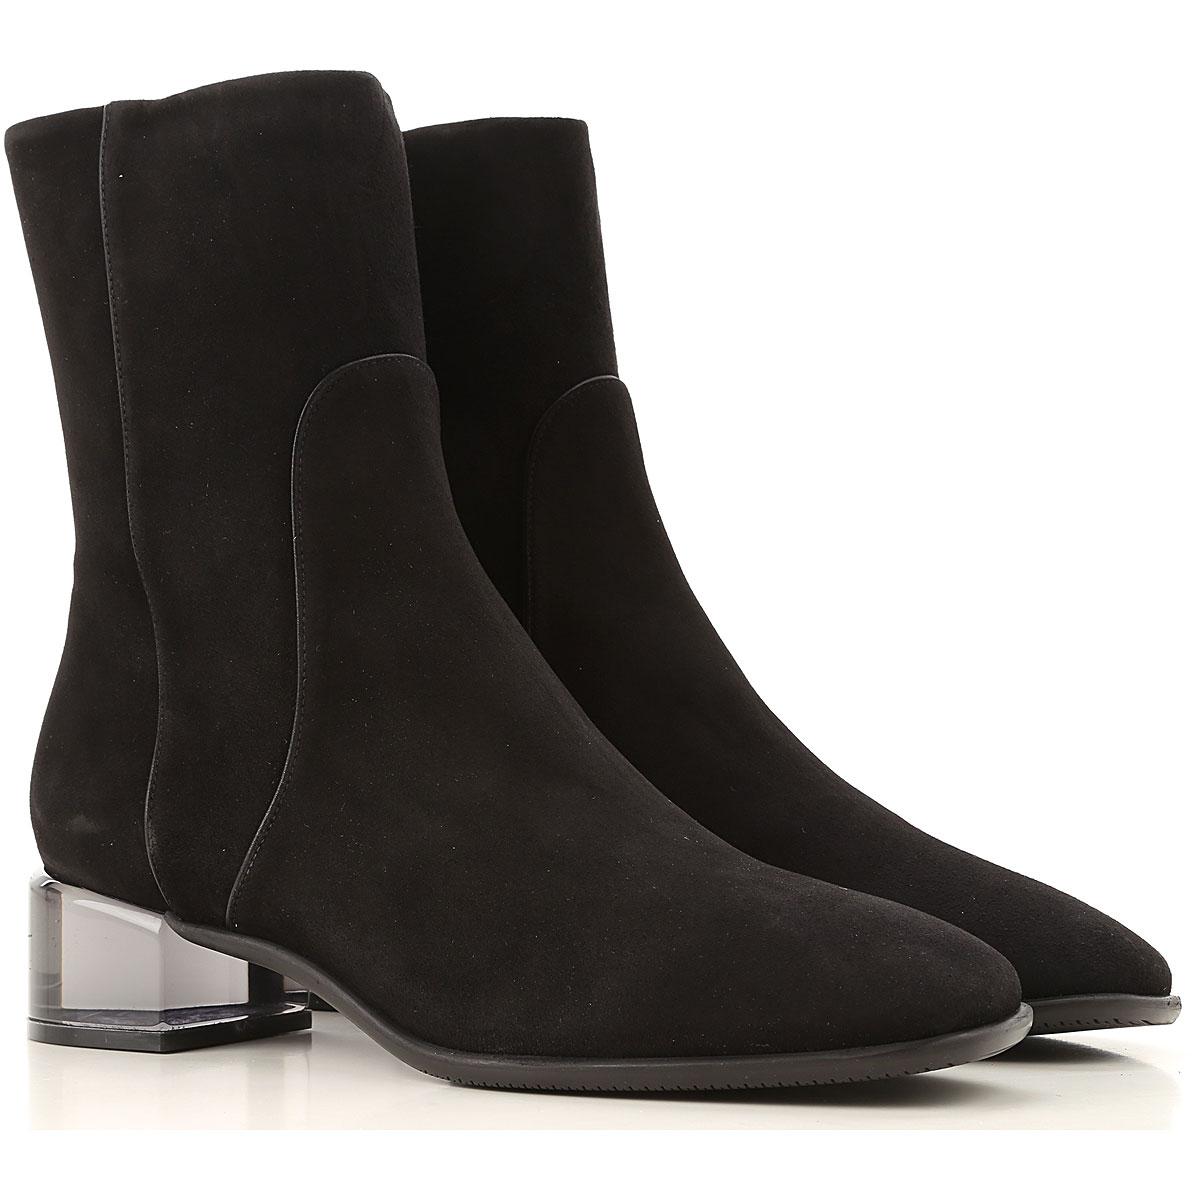 Stuart Weitzman Boots for Women, Booties On Sale, Black, Suede leather, 2019, US 4.5 ( EU 35) US 5.5 (EU 36) US 6.5 (EU 37) US 7.5 (EU 38) US 8.5 (E